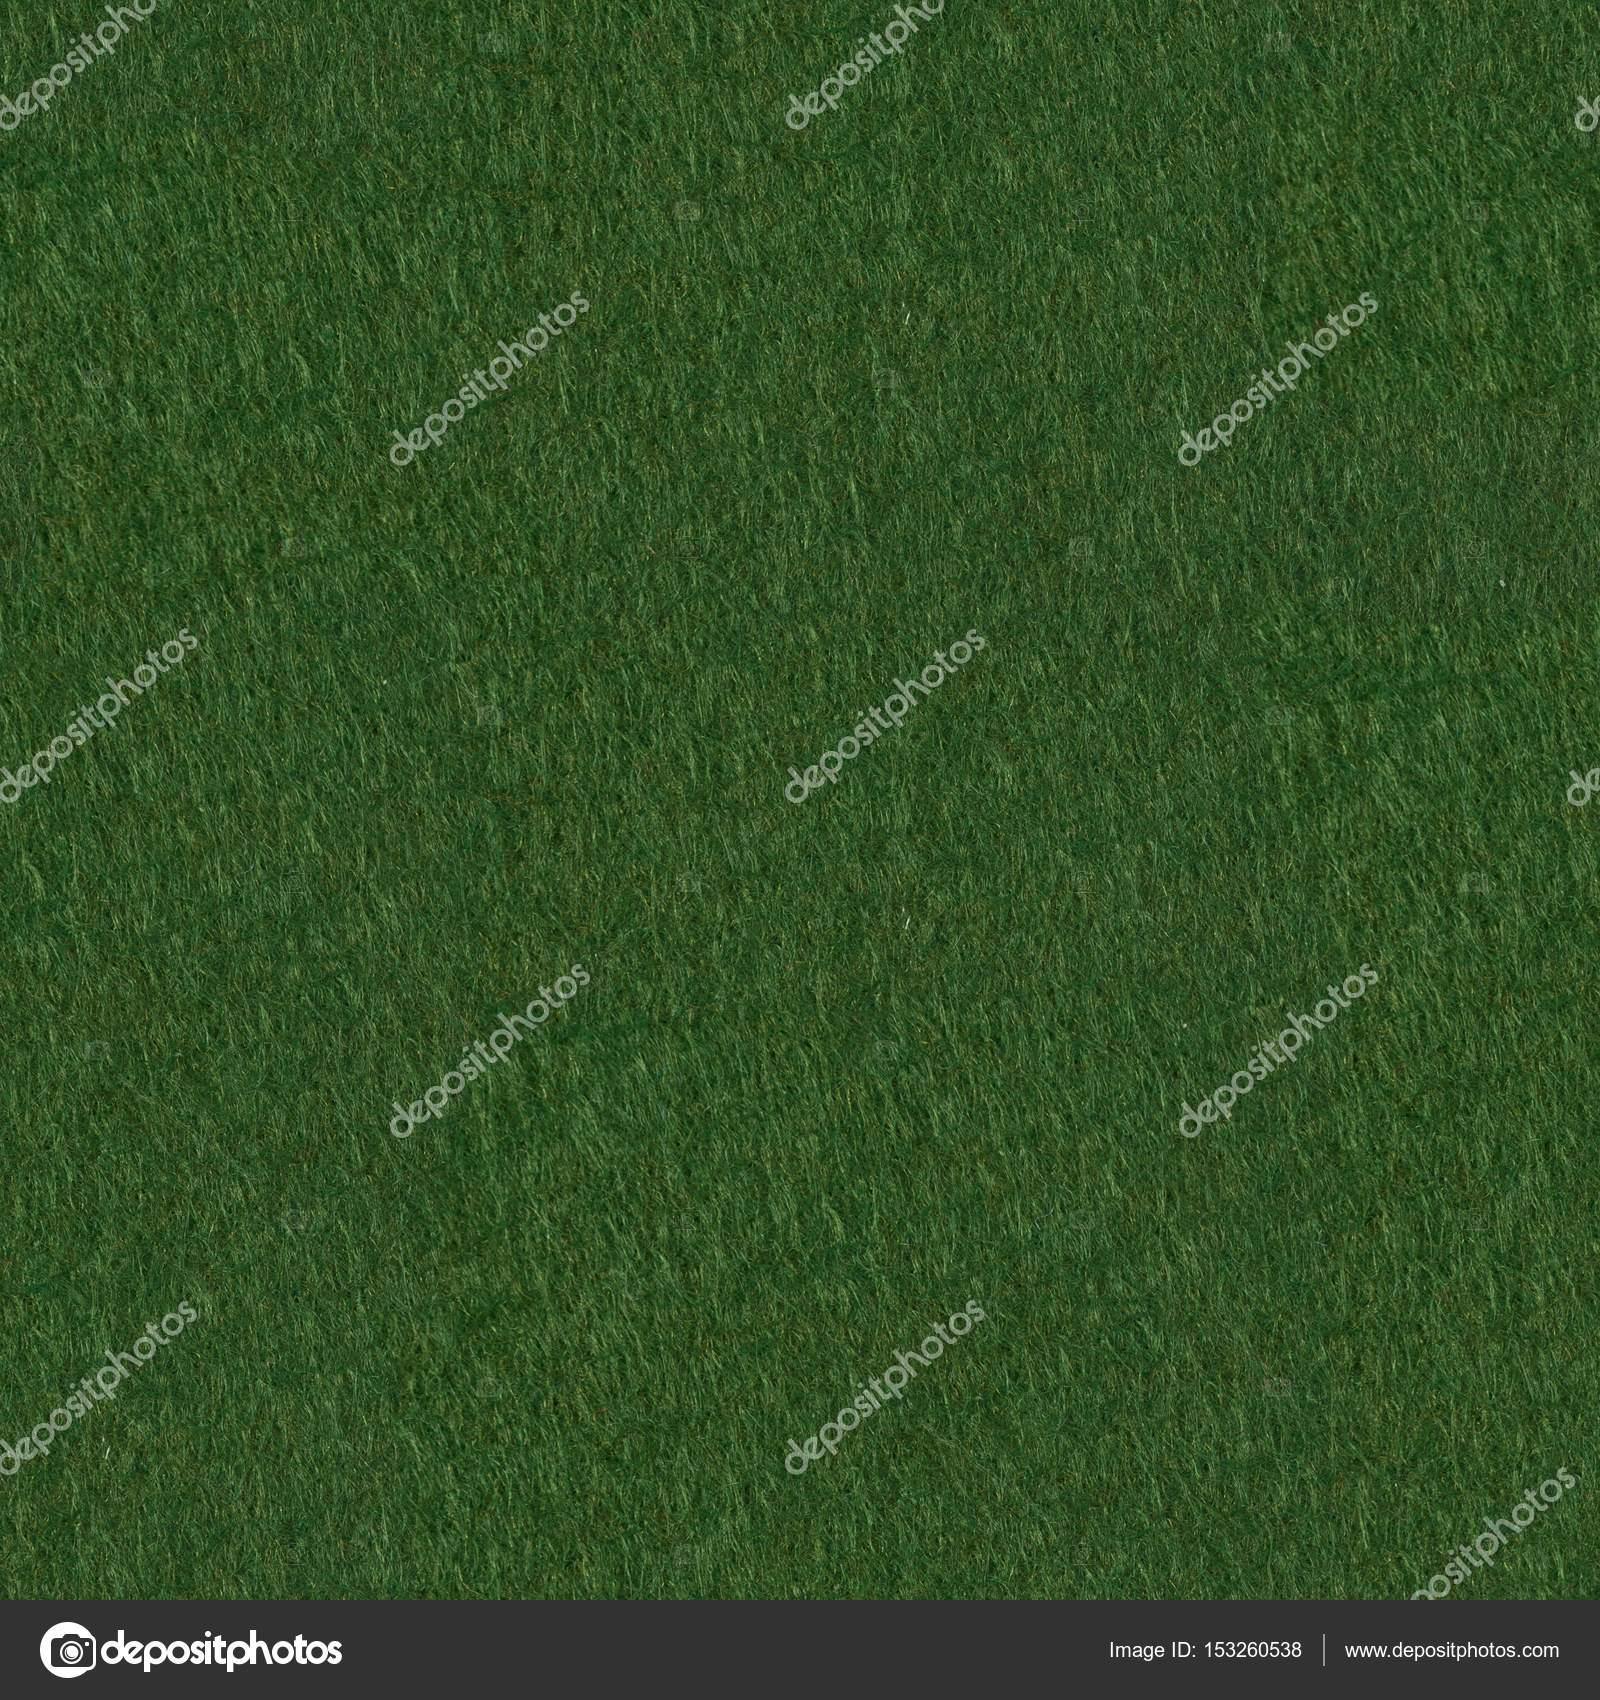 Grass background tile Cartoony Seamless Square Background Tile Stock Photo Depositphotos Macro Shot Of Green Felt Cloth Seamless Square Background Tile